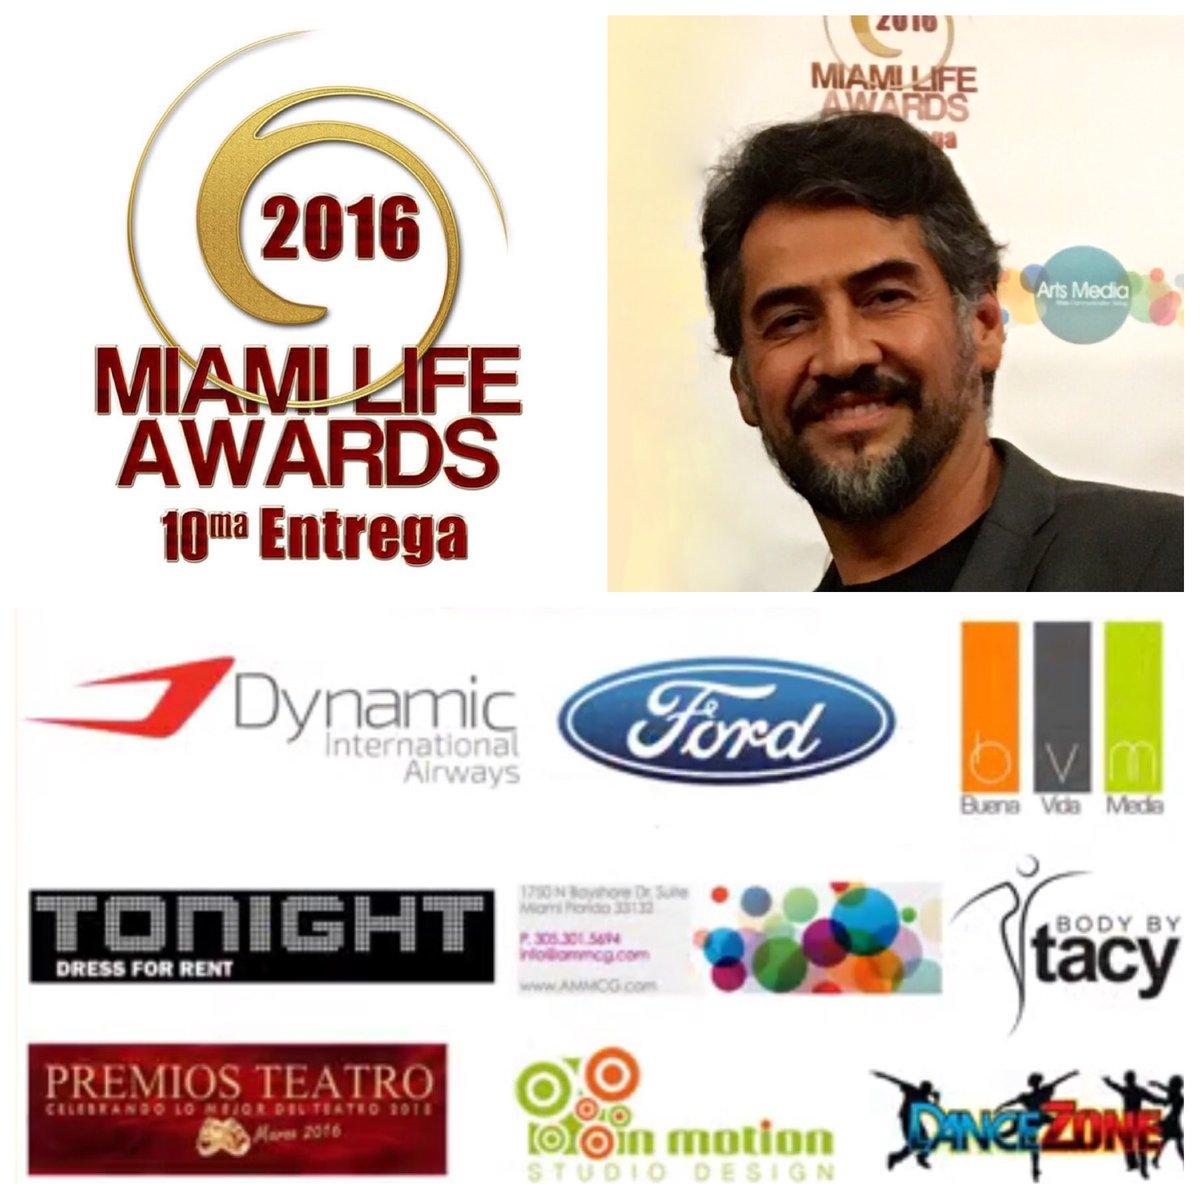 #MiamiLifeAwards 10ma Entrega - Telenovela Actor Protagonista del Año gana @Gabriel_Porras en #BajoElMismoCielo https://t.co/1e2YMwwZev